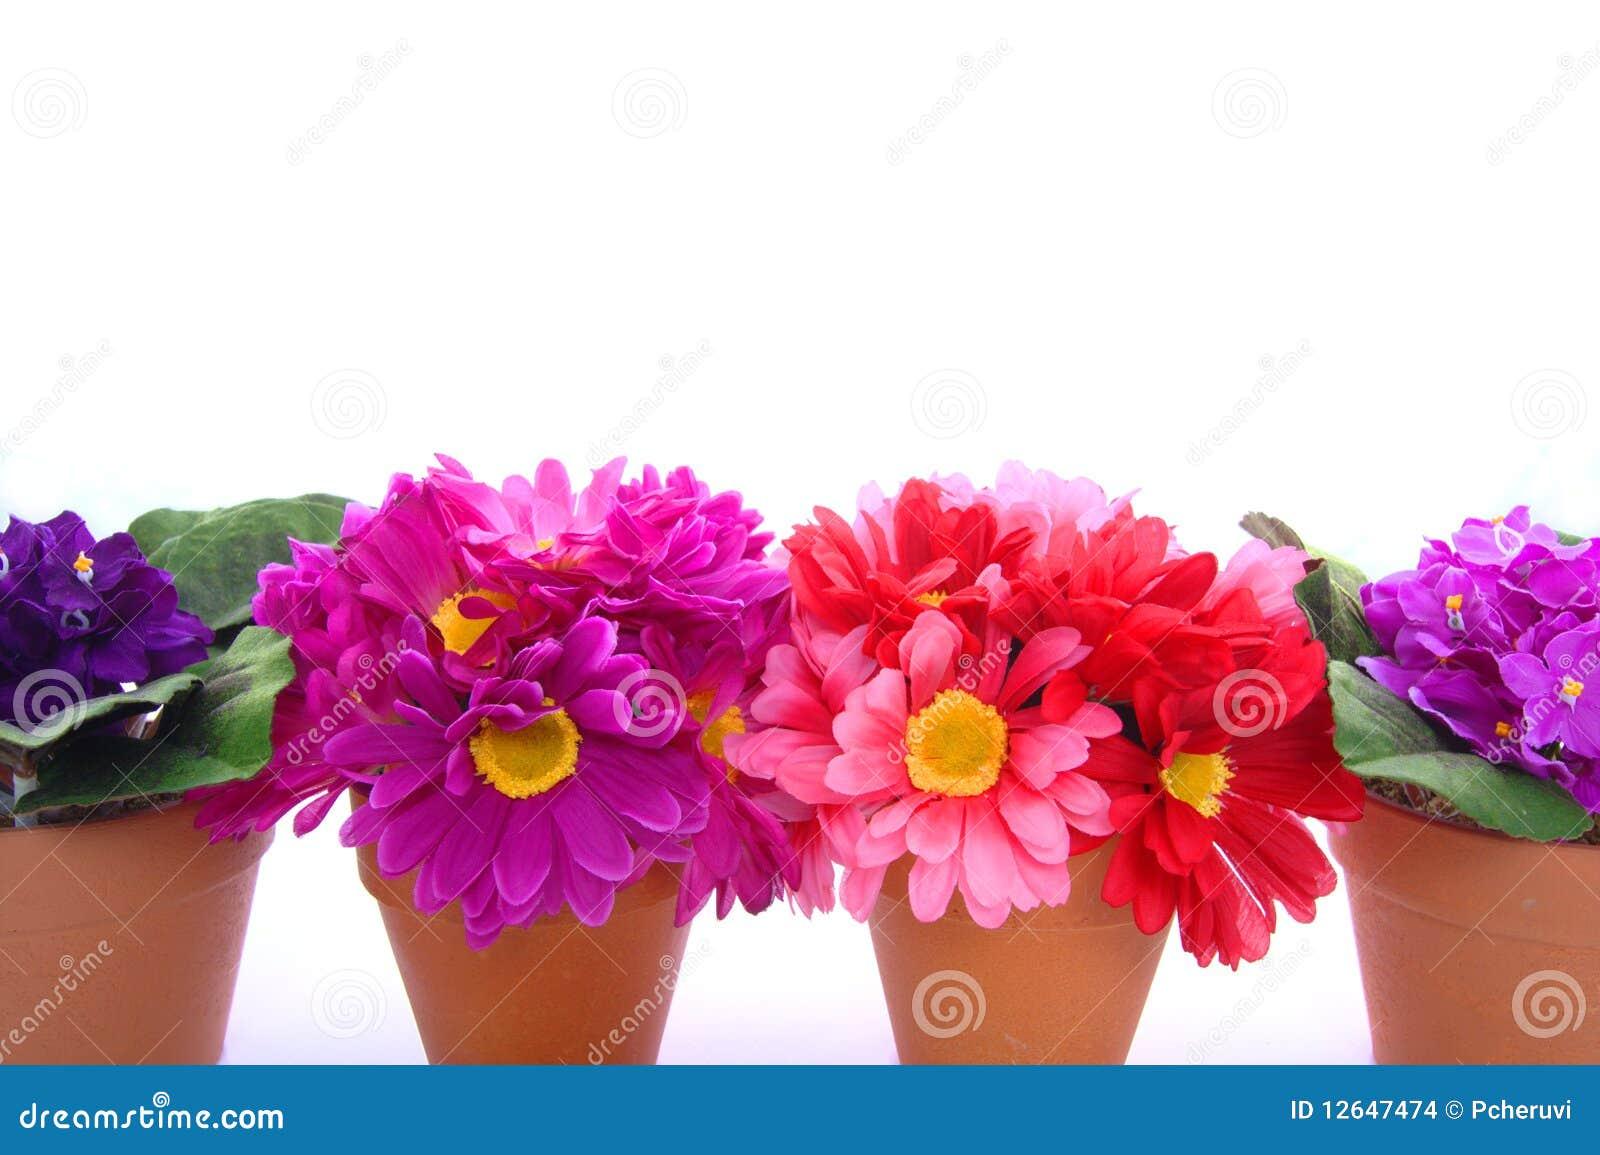 Row of flower pots